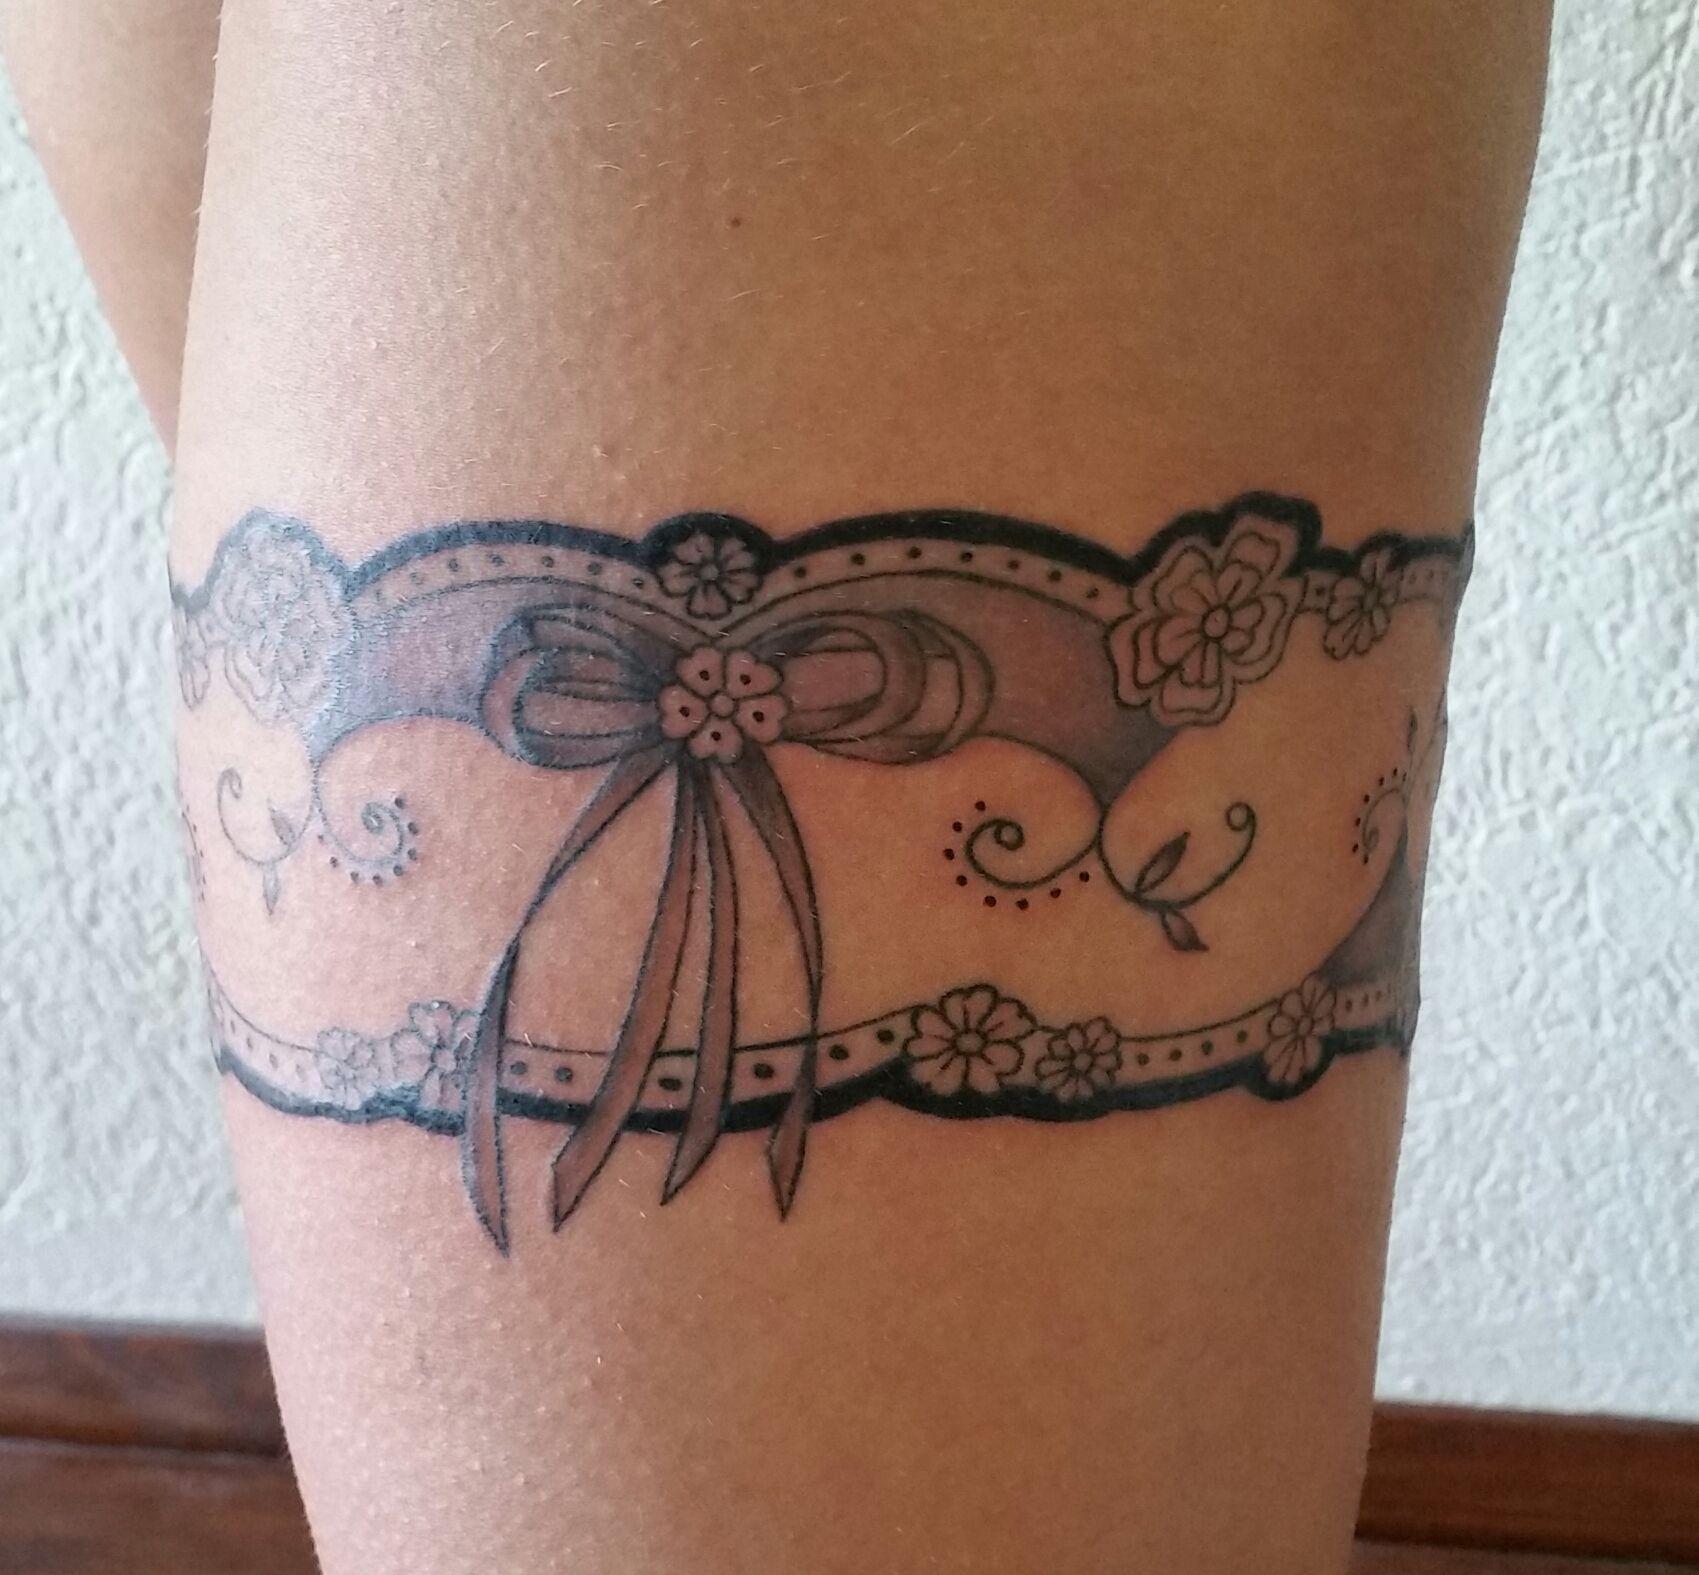 tattoo kousenband google search tattoos pinterest tattoo ideen tattoo vorlagen und ideen. Black Bedroom Furniture Sets. Home Design Ideas